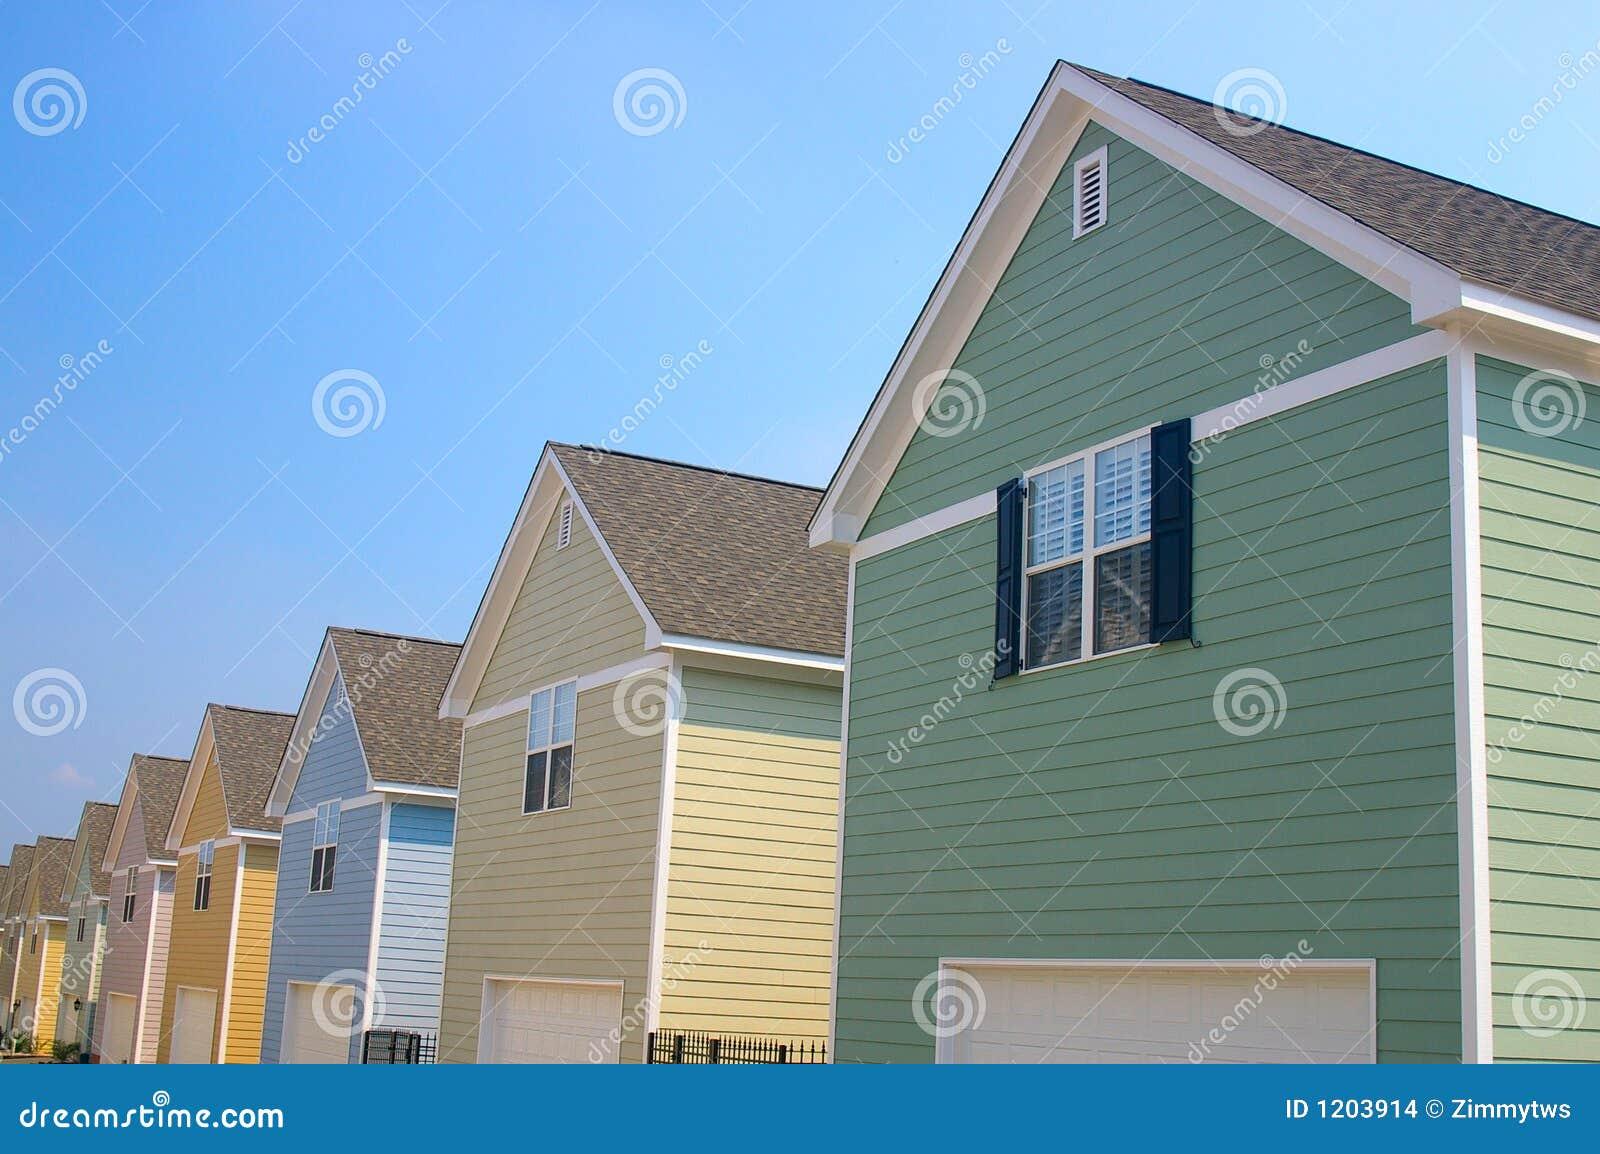 Bright houses